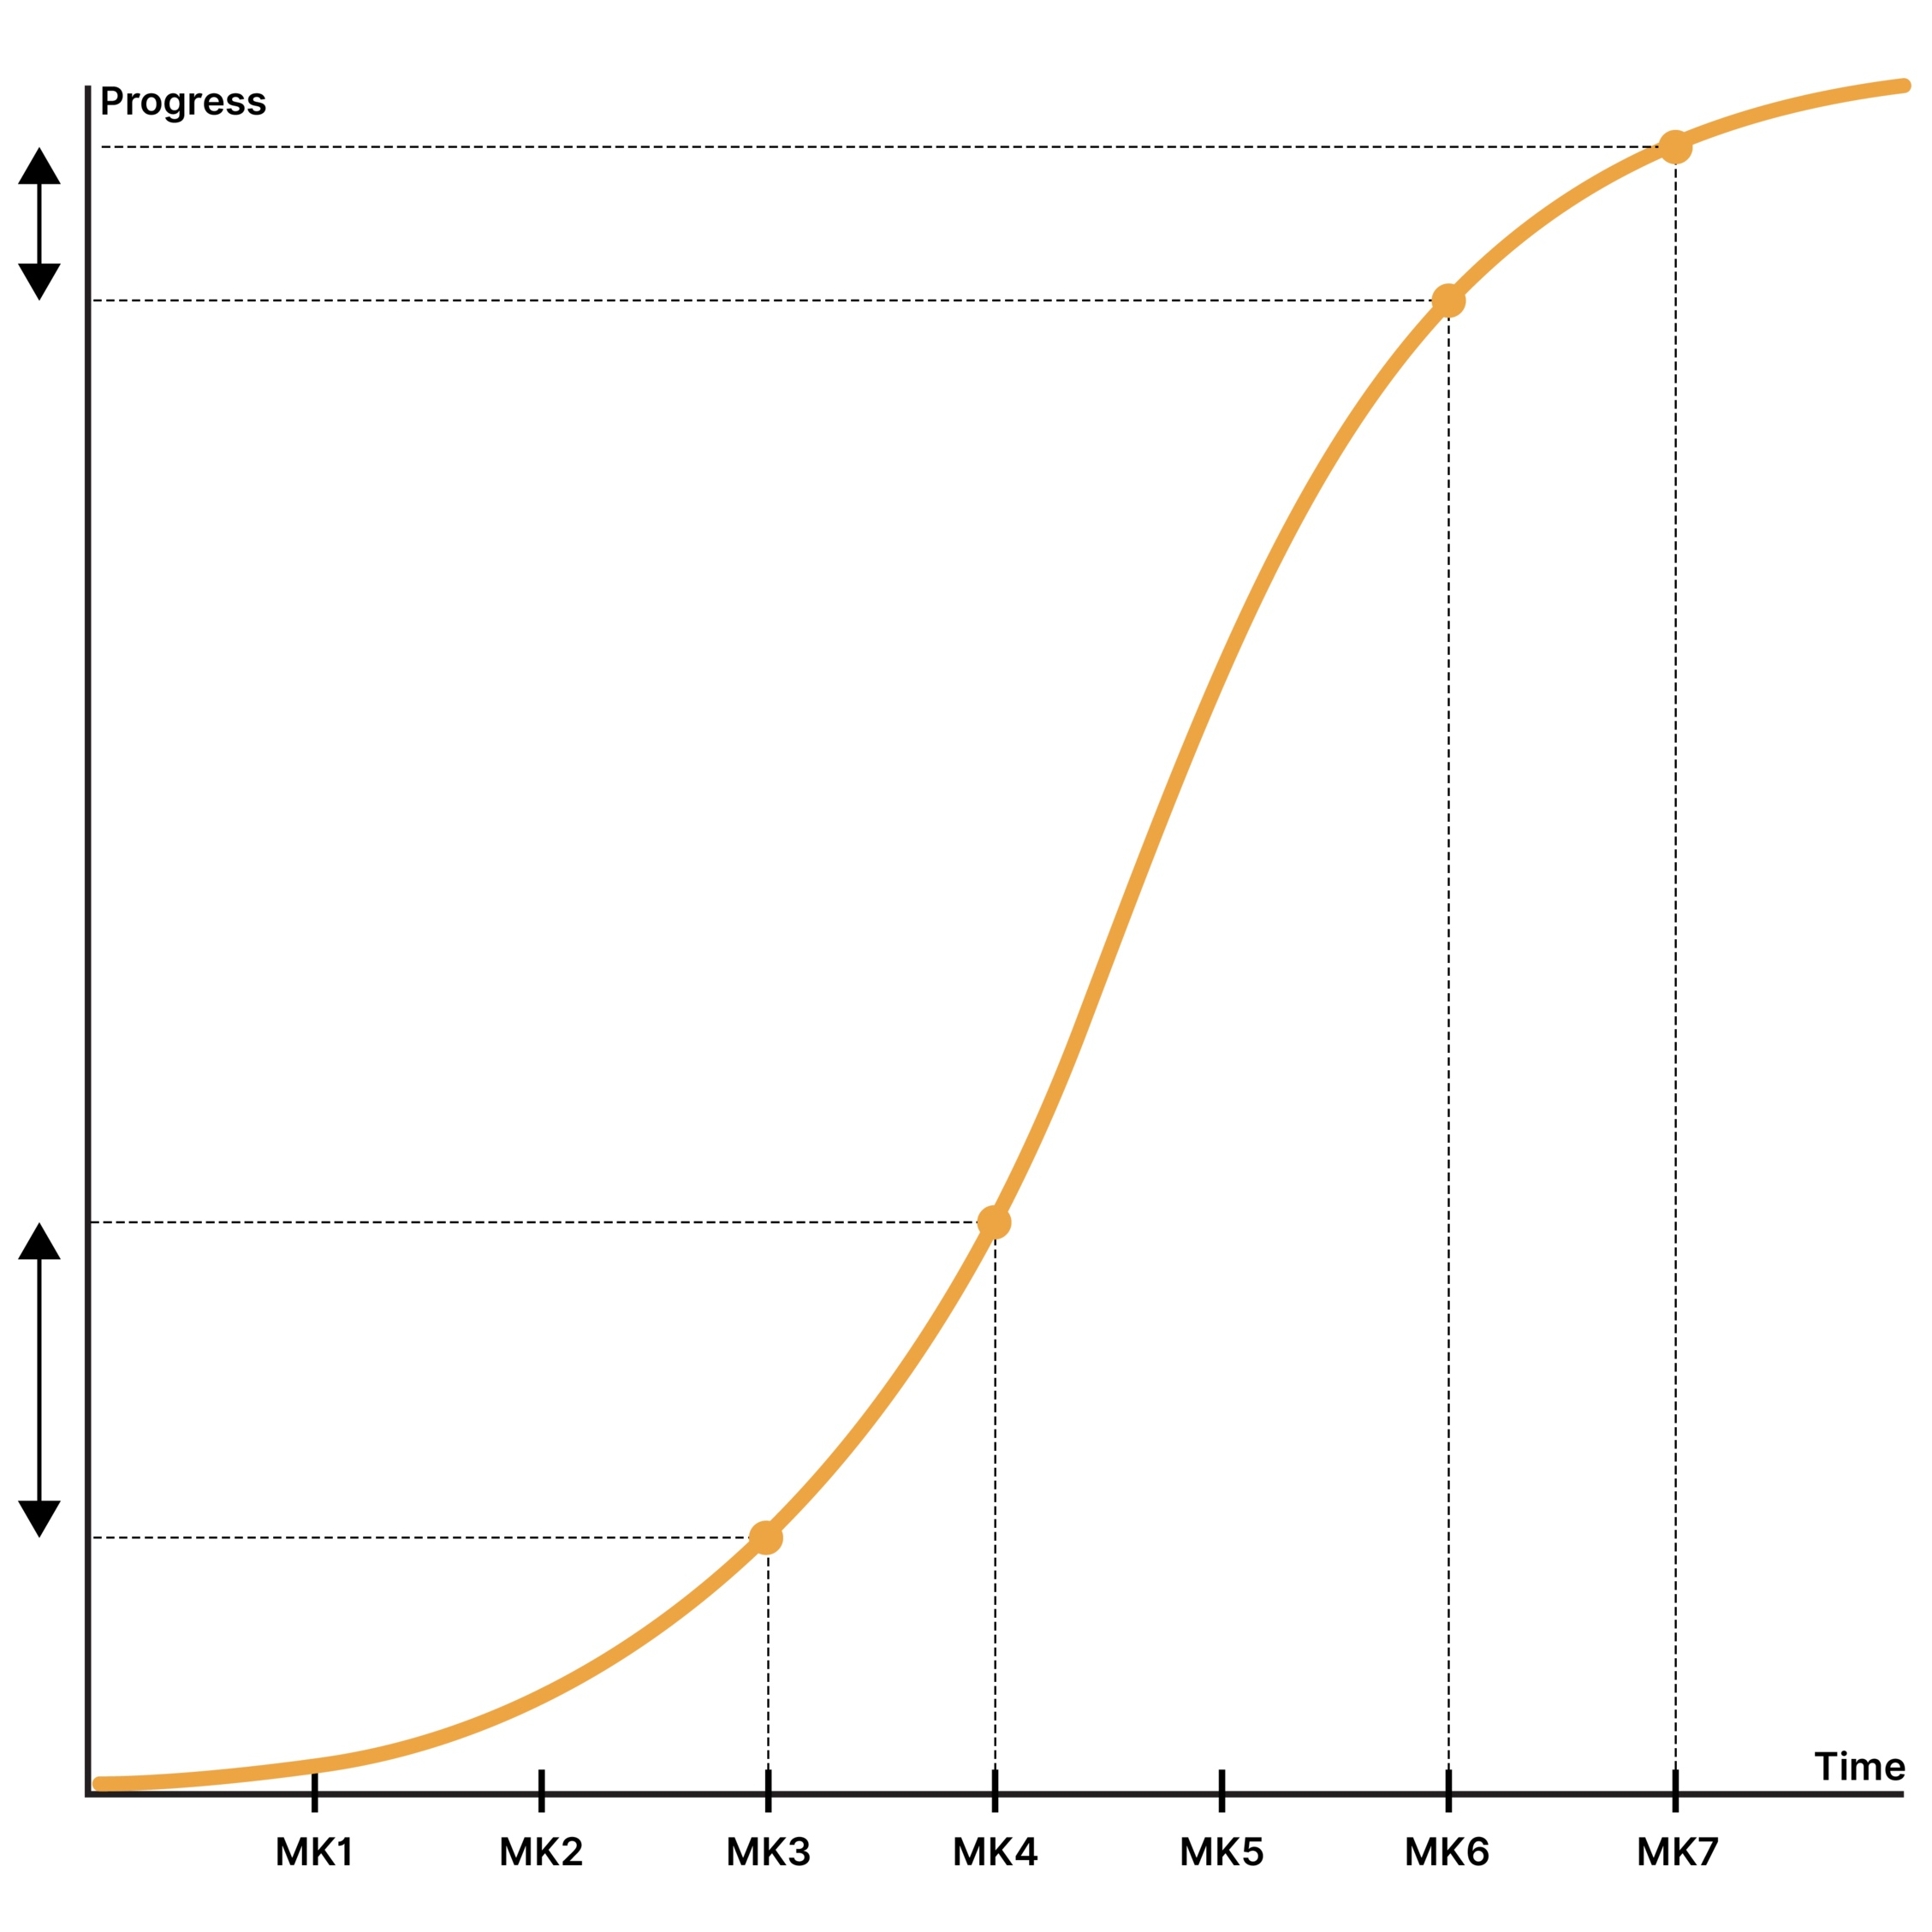 Time vs technological progress of the Volkswagen Golf